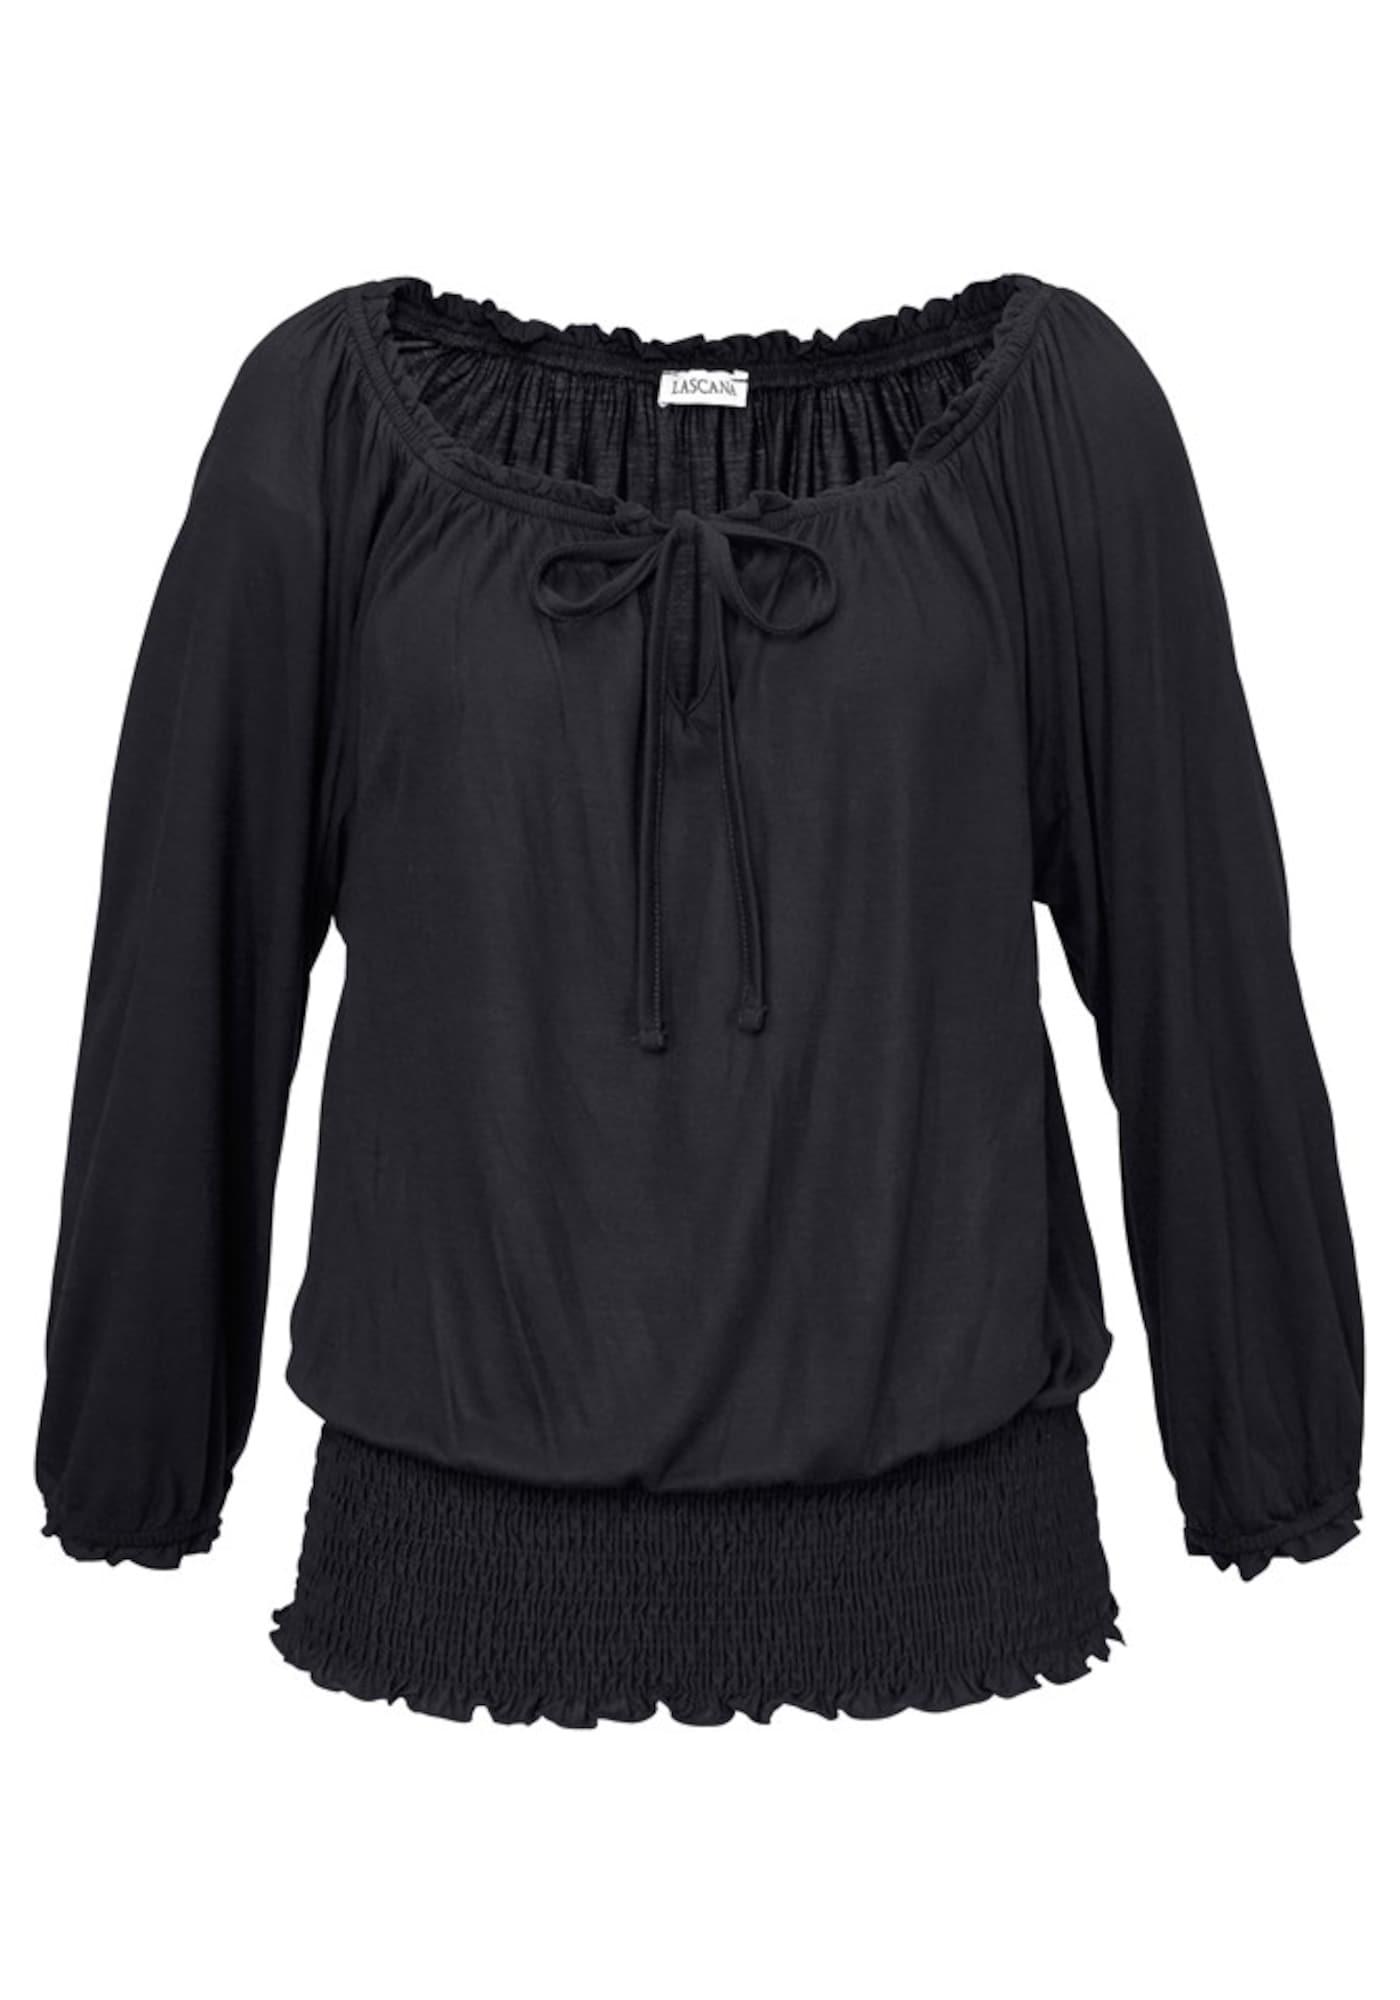 Carmenshirt | Bekleidung > Shirts > Carmenshirts & Wasserfallshirts | Schwarz | Lascana